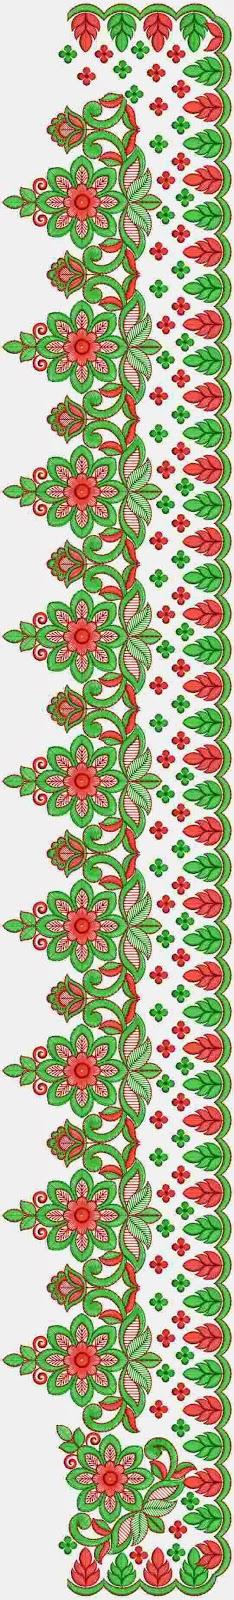 Embdesigntube Latest Saree Embroidery Designs